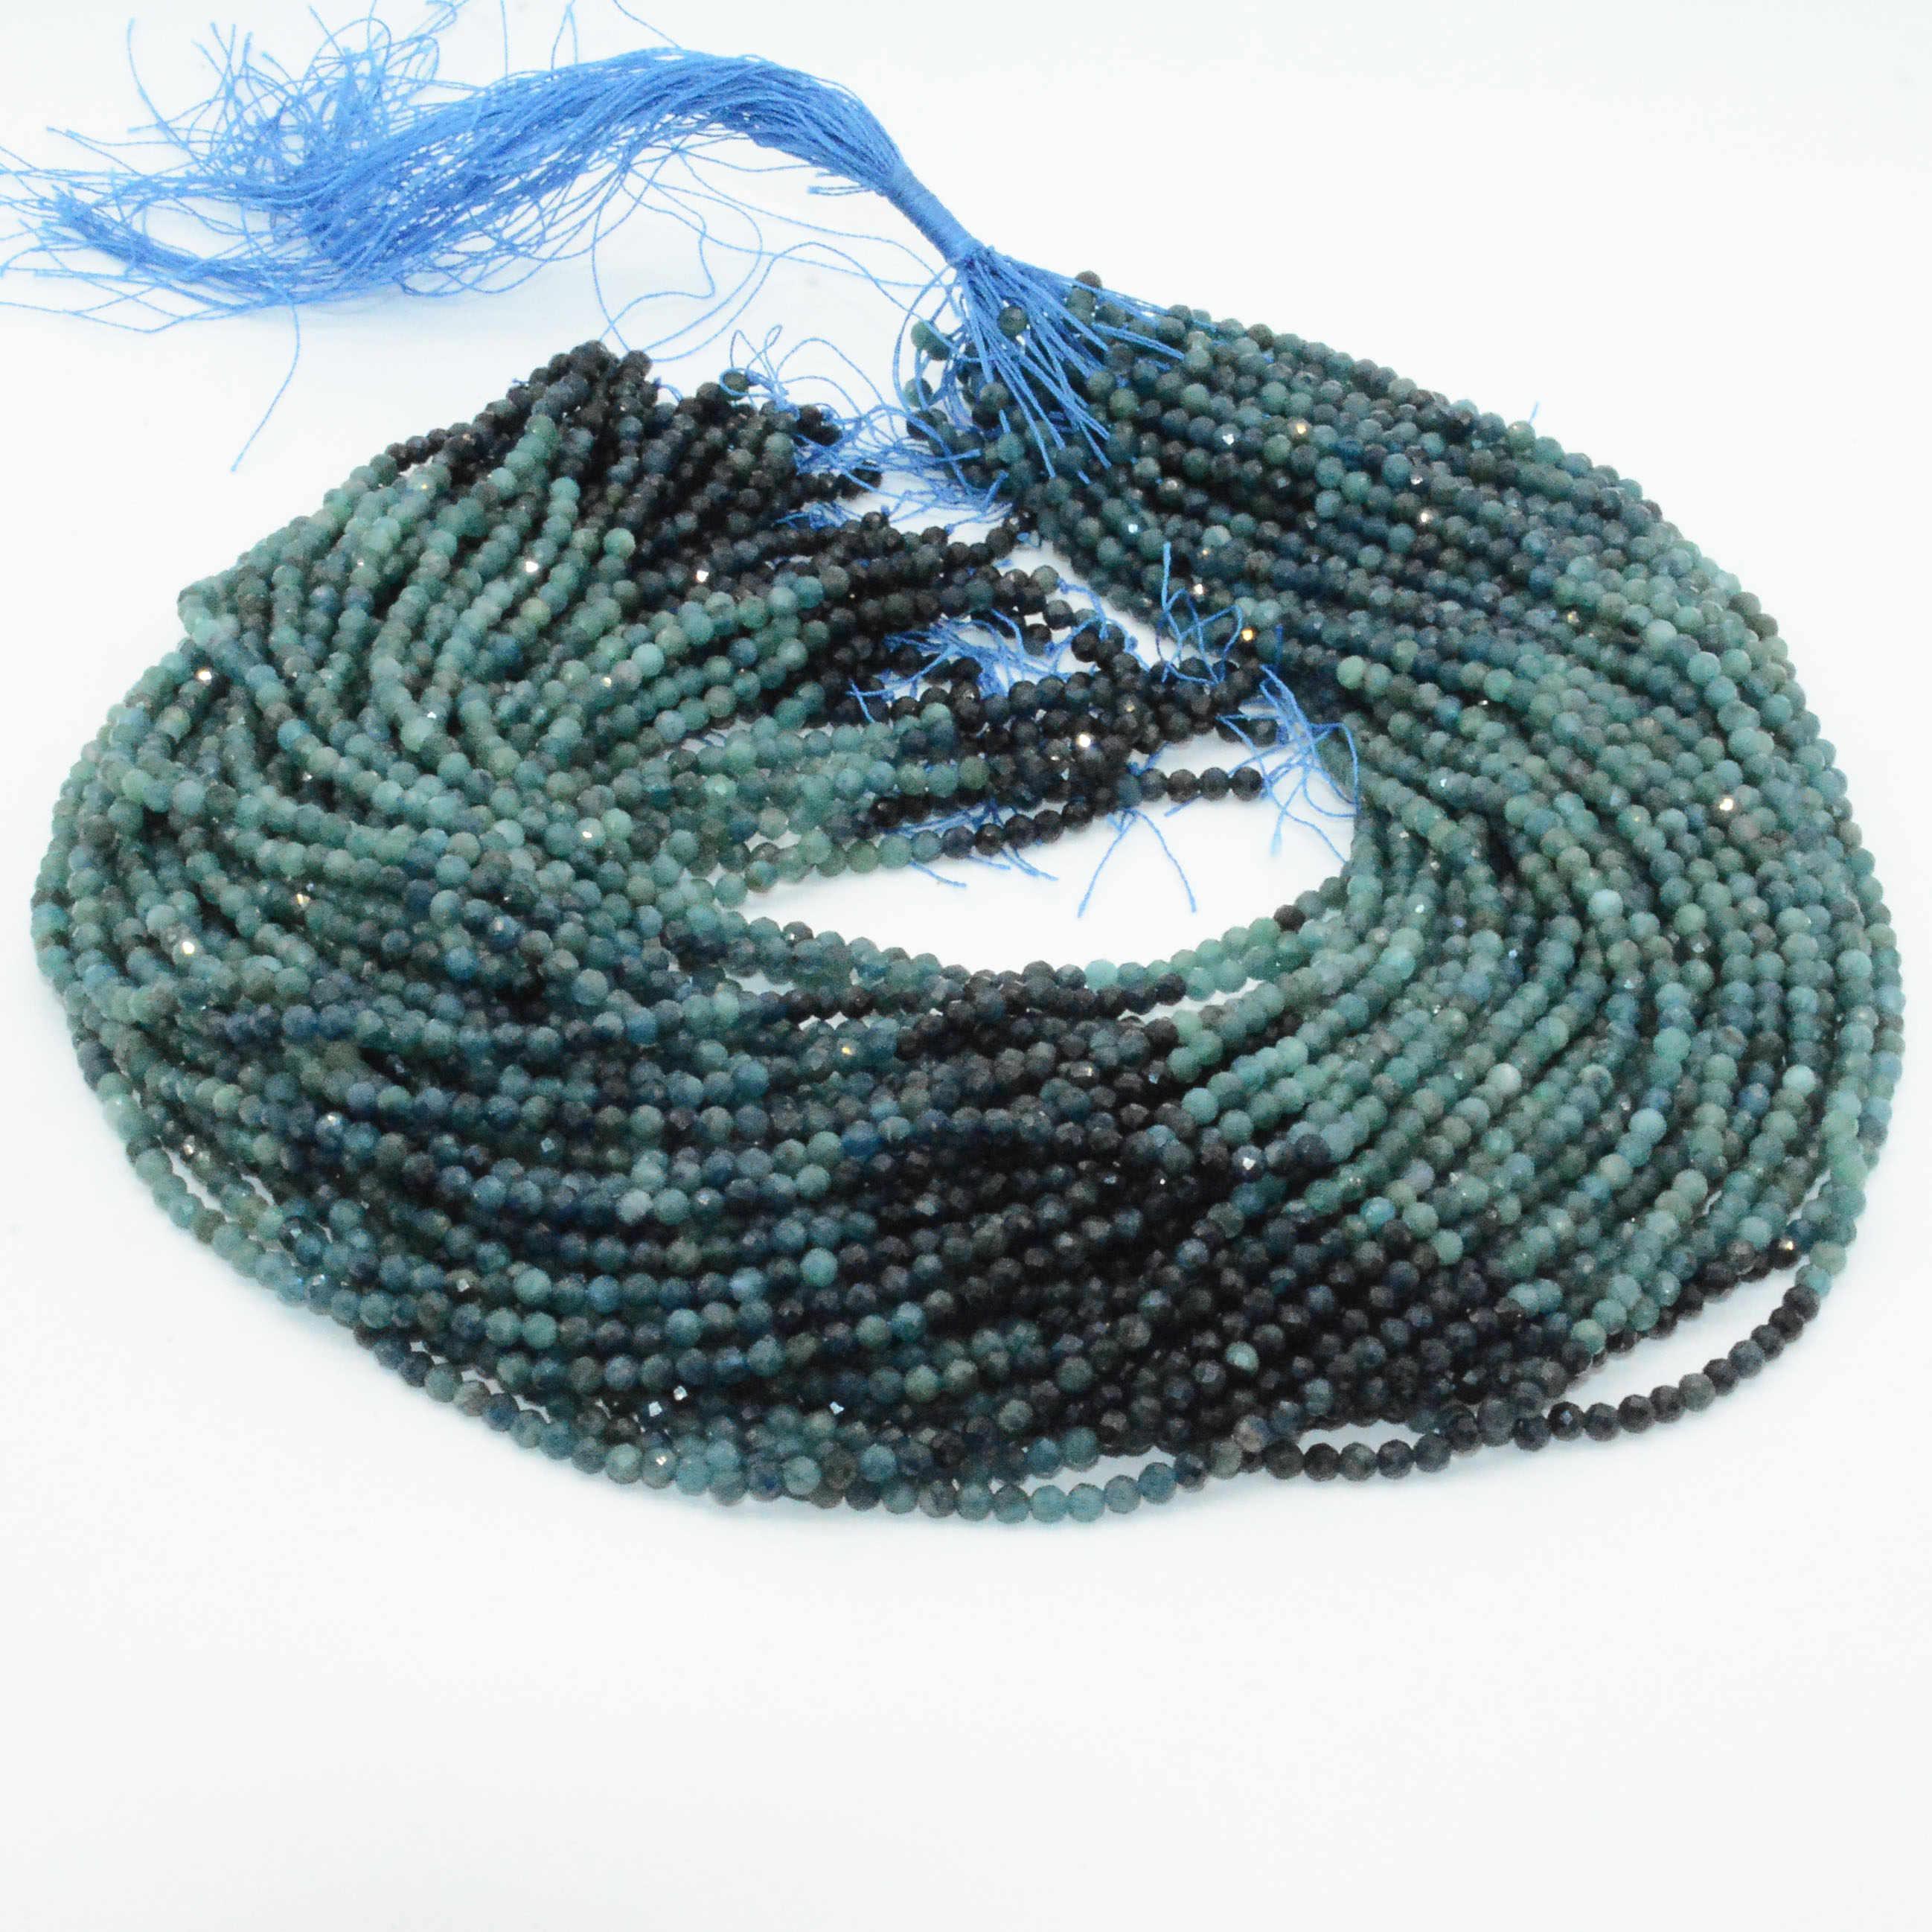 Natural Blue Tourmaline Uncut Rough Pencil Loose Beads 7-11 mm 8 Strand 11309